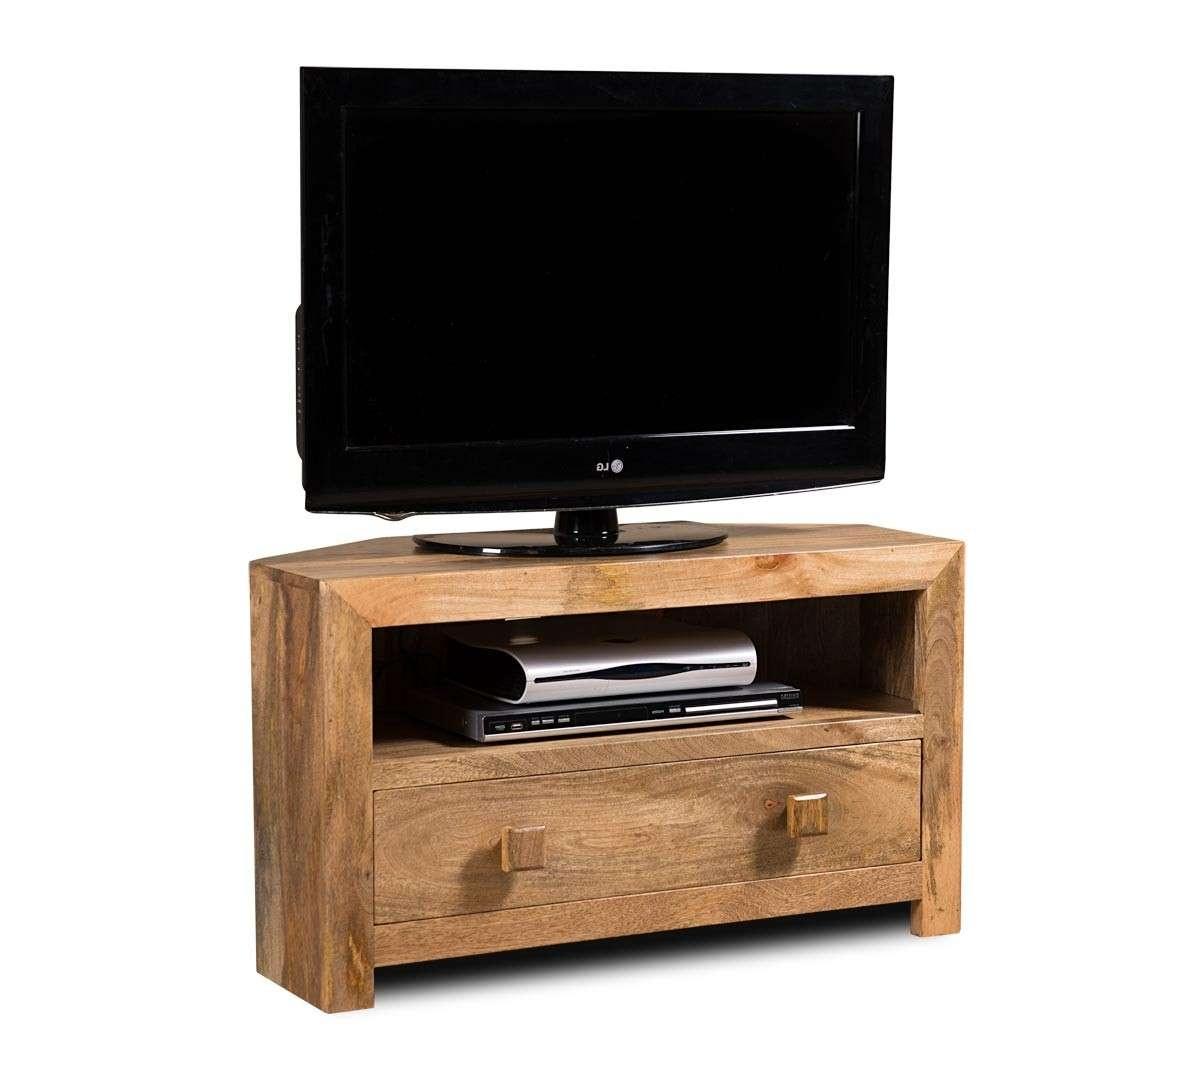 Dakota Light Mango Small Corner Tv Stand | Casa Bella Furniture Uk With Regard To Large Corner Tv Stands (View 4 of 15)